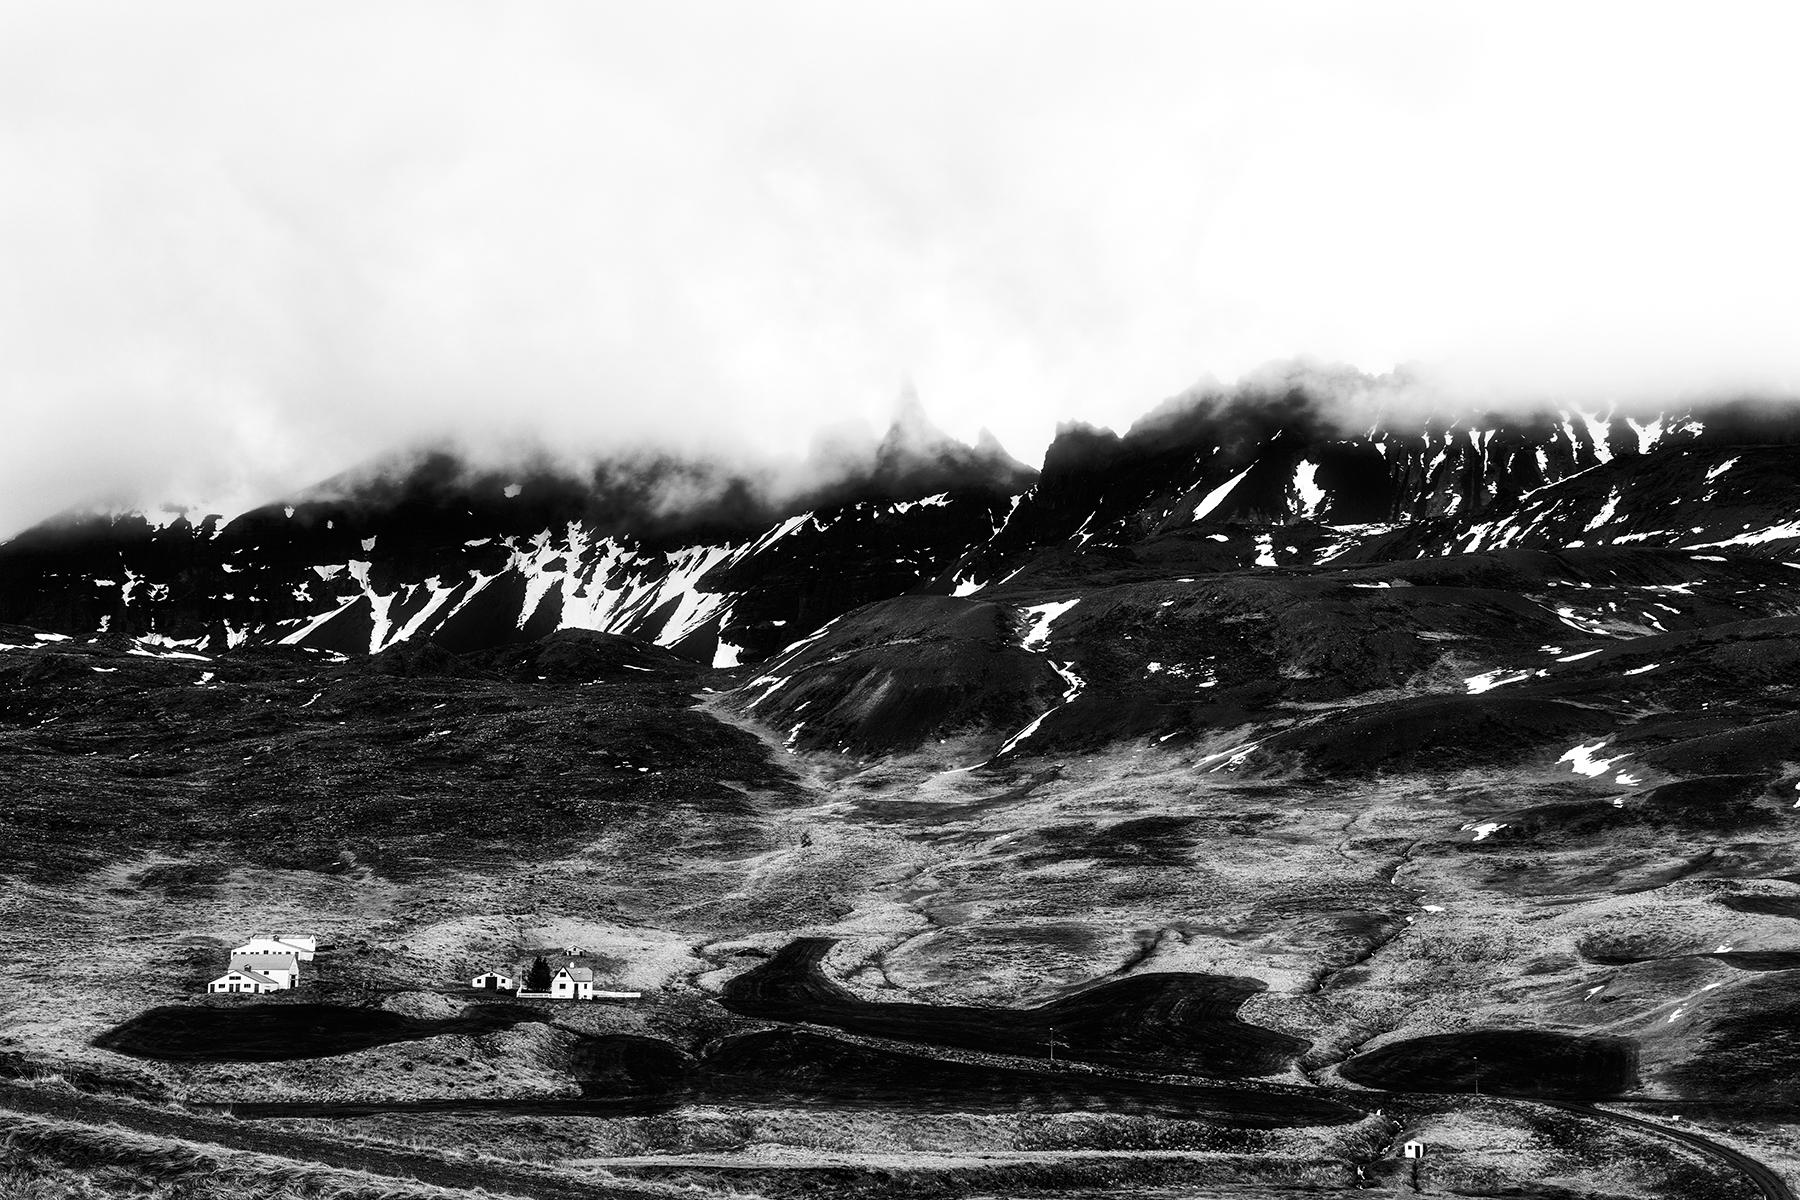 Looming oxnadalur fog - black & white photo